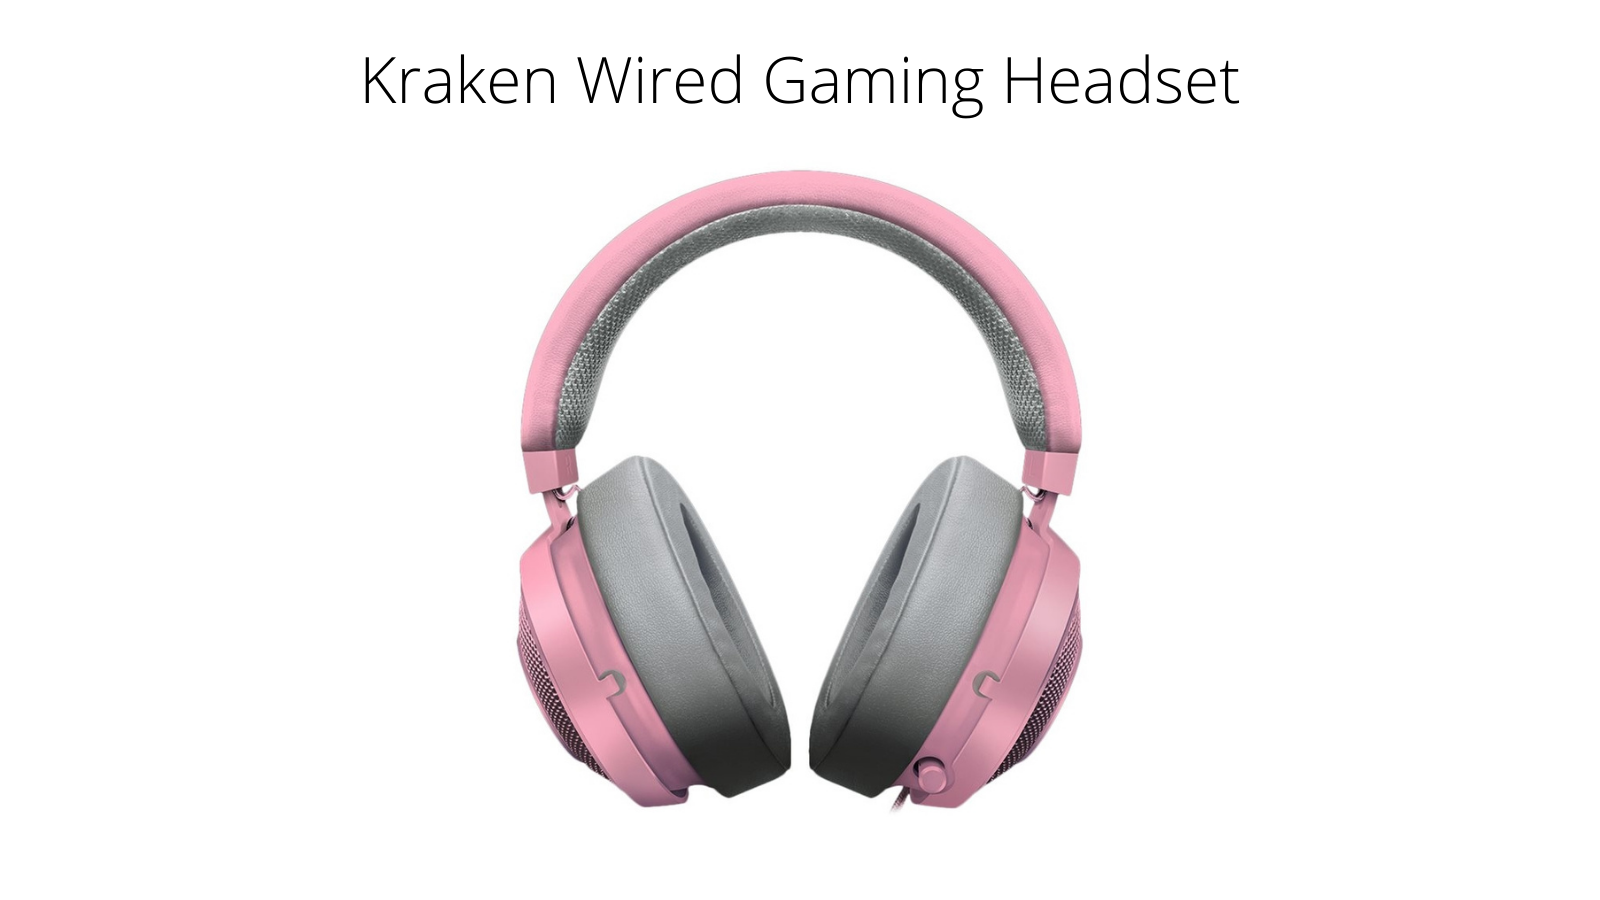 Razer Kraken Wired Gaming Headset